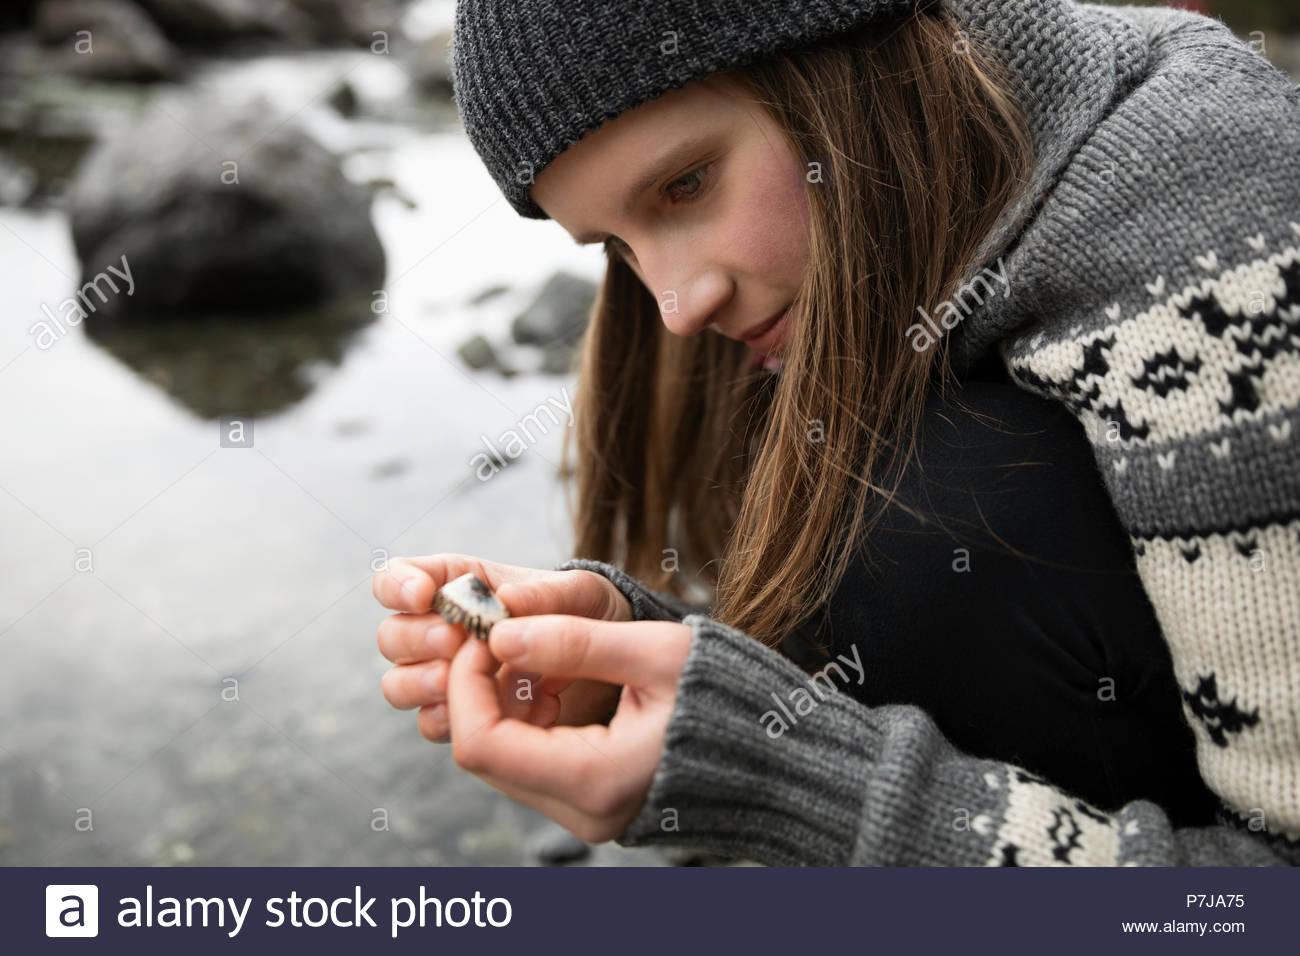 Teen teen girl explores girl seems, will